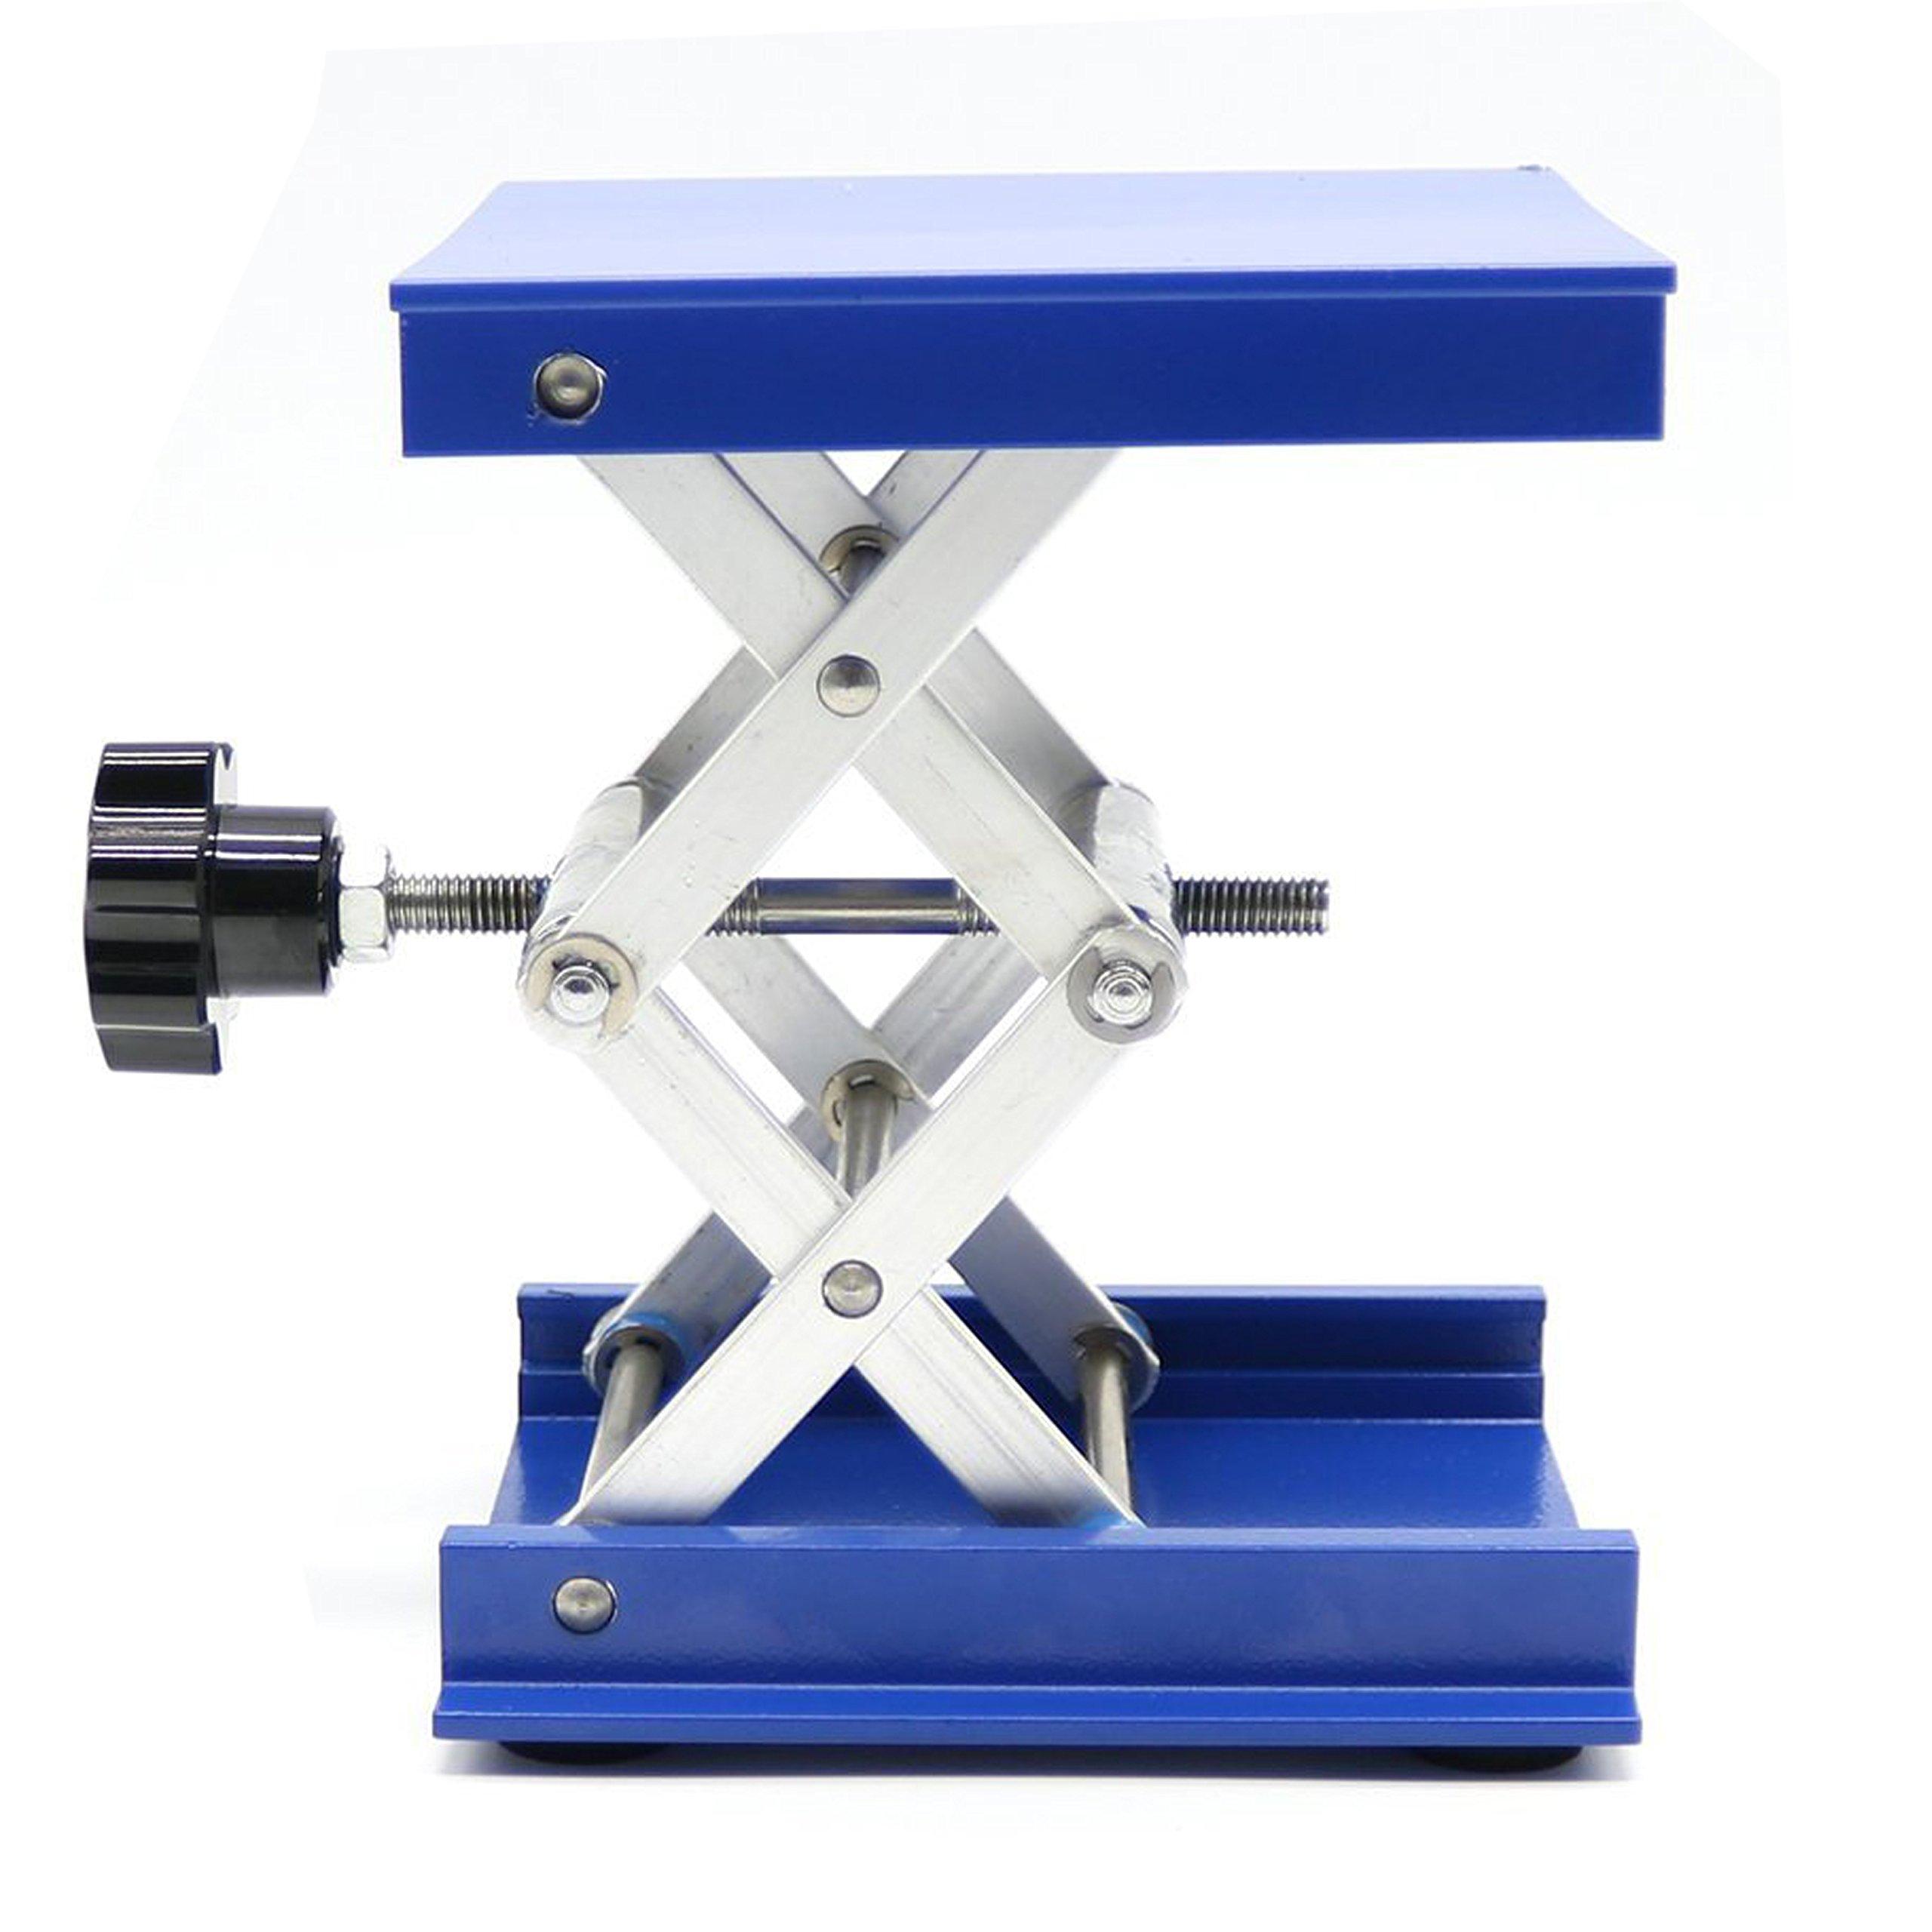 OESS Lift Table Aluminium Oxide Lab Stand Lifter Scientific Scissor Lifting Jack Platform 4''X4''